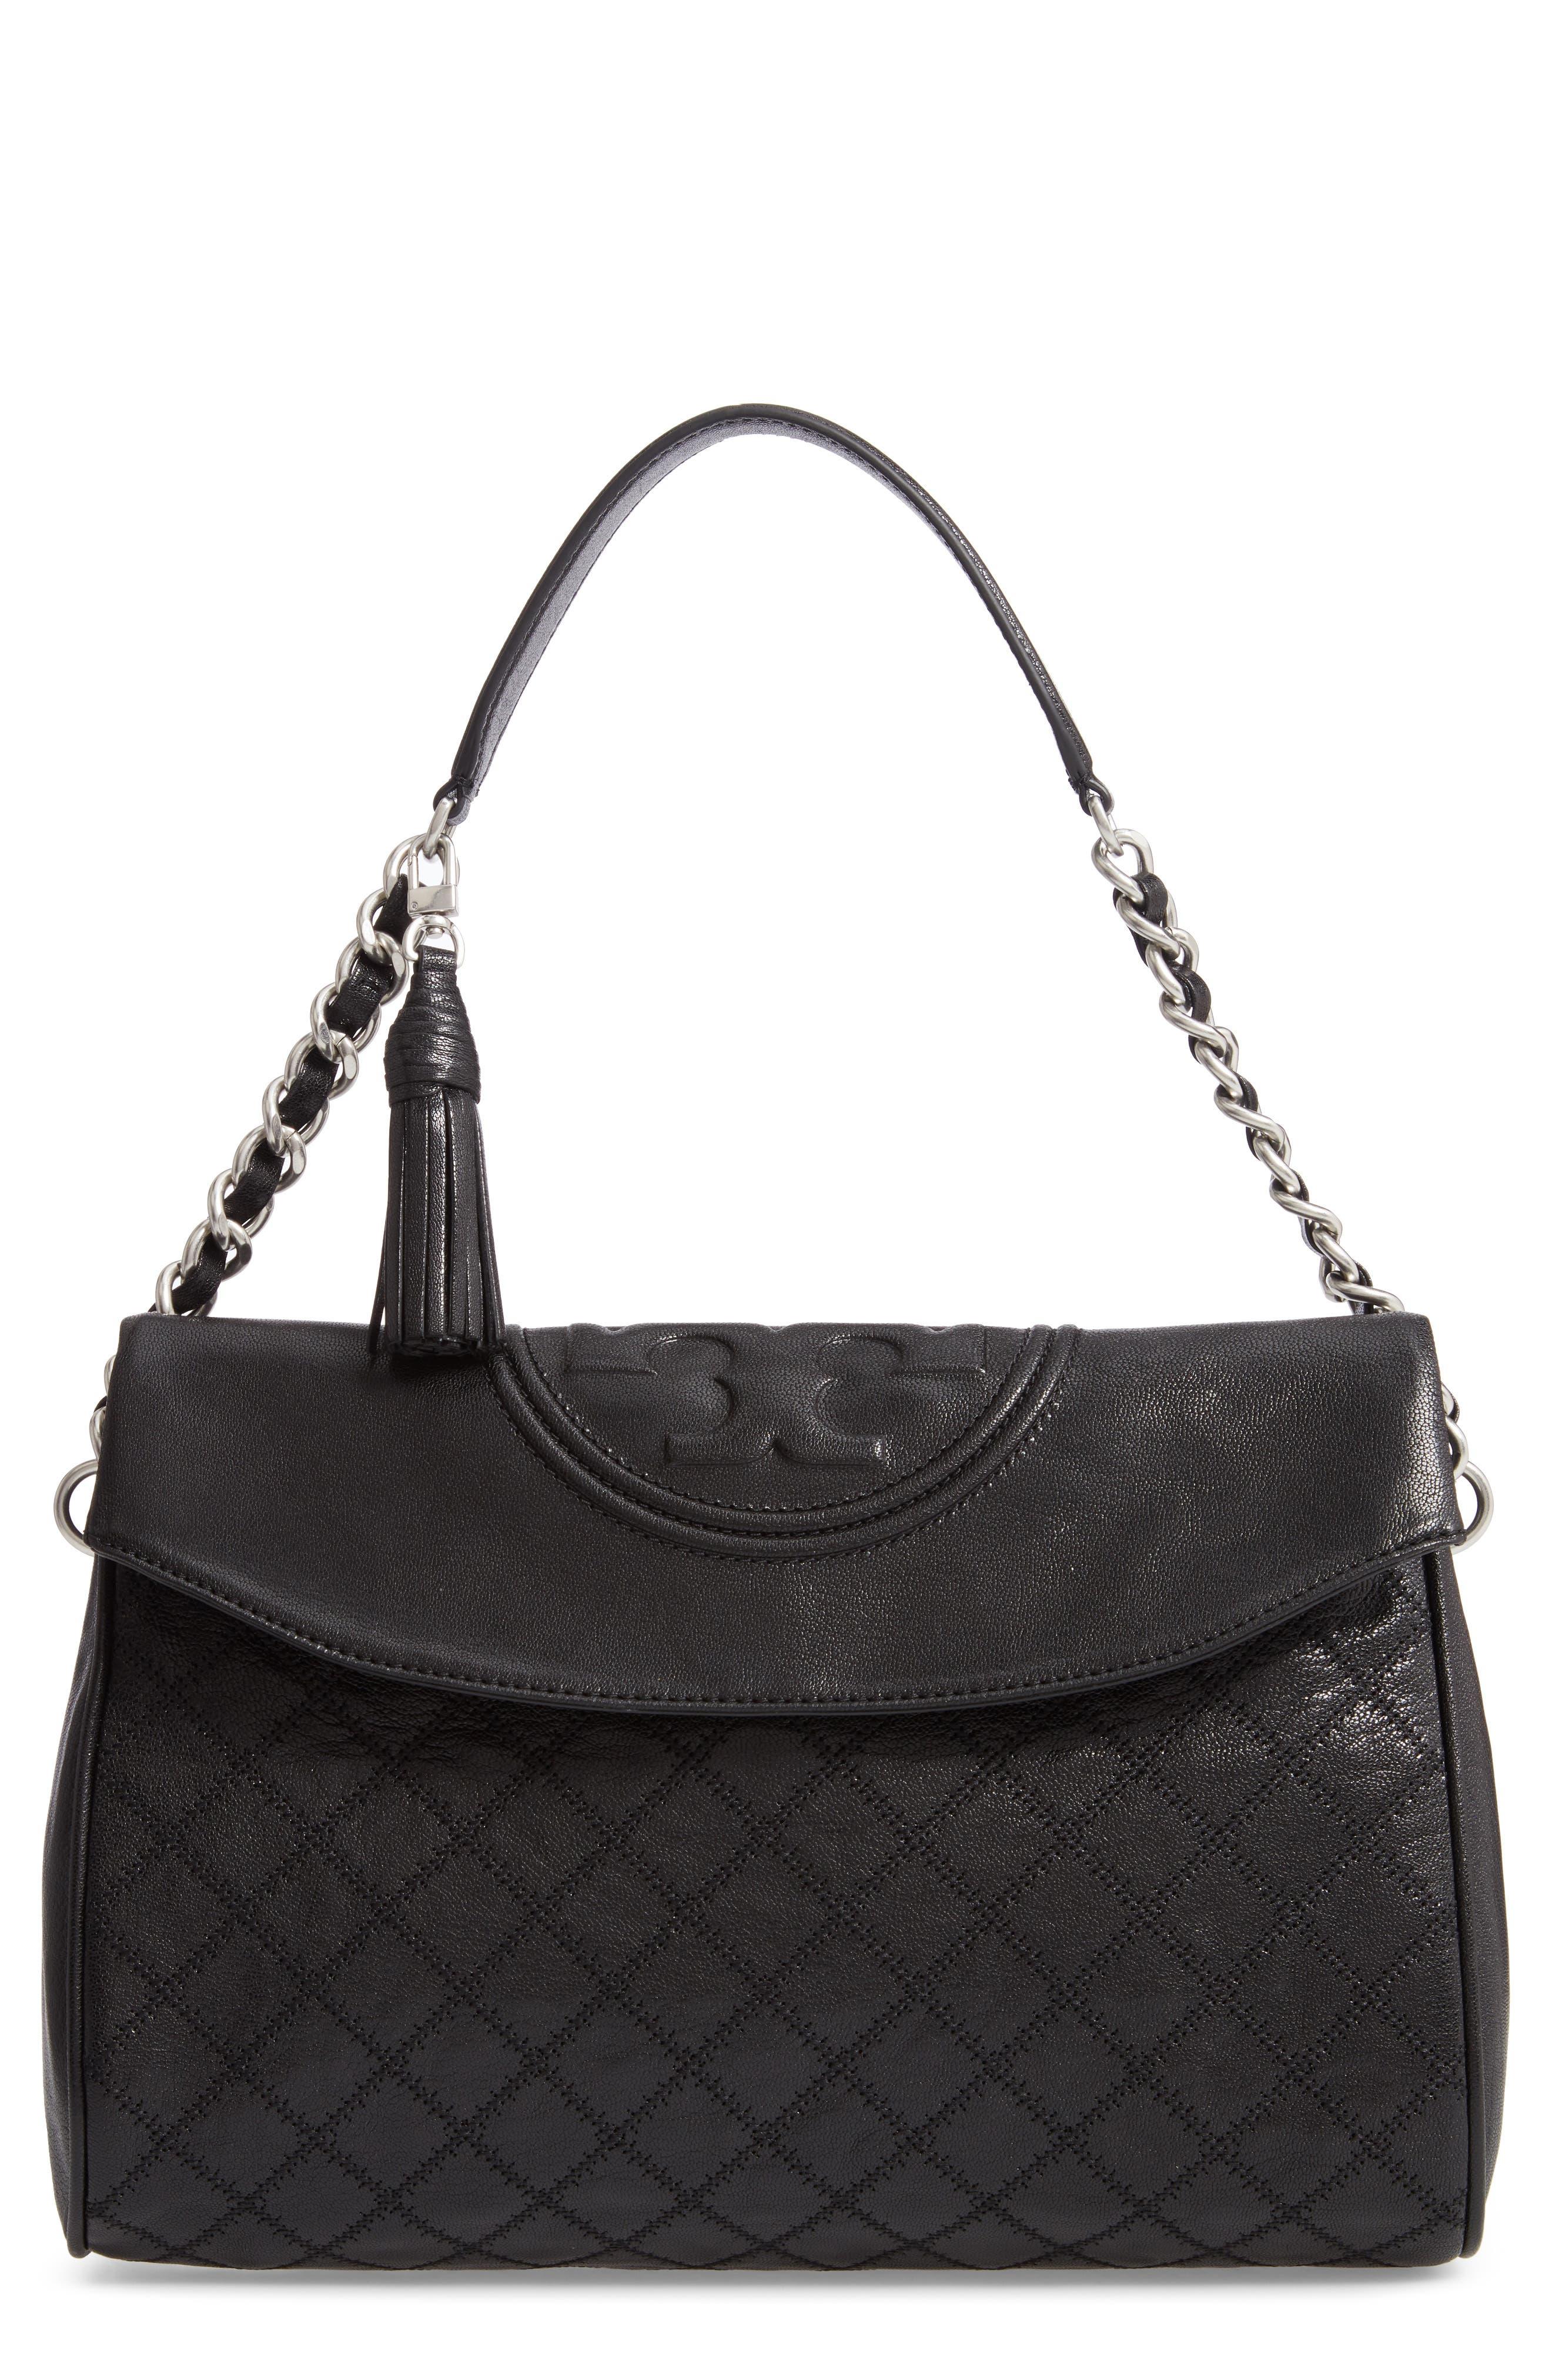 Fleming Leather Foldover Hobo,                         Main,                         color, BLACK